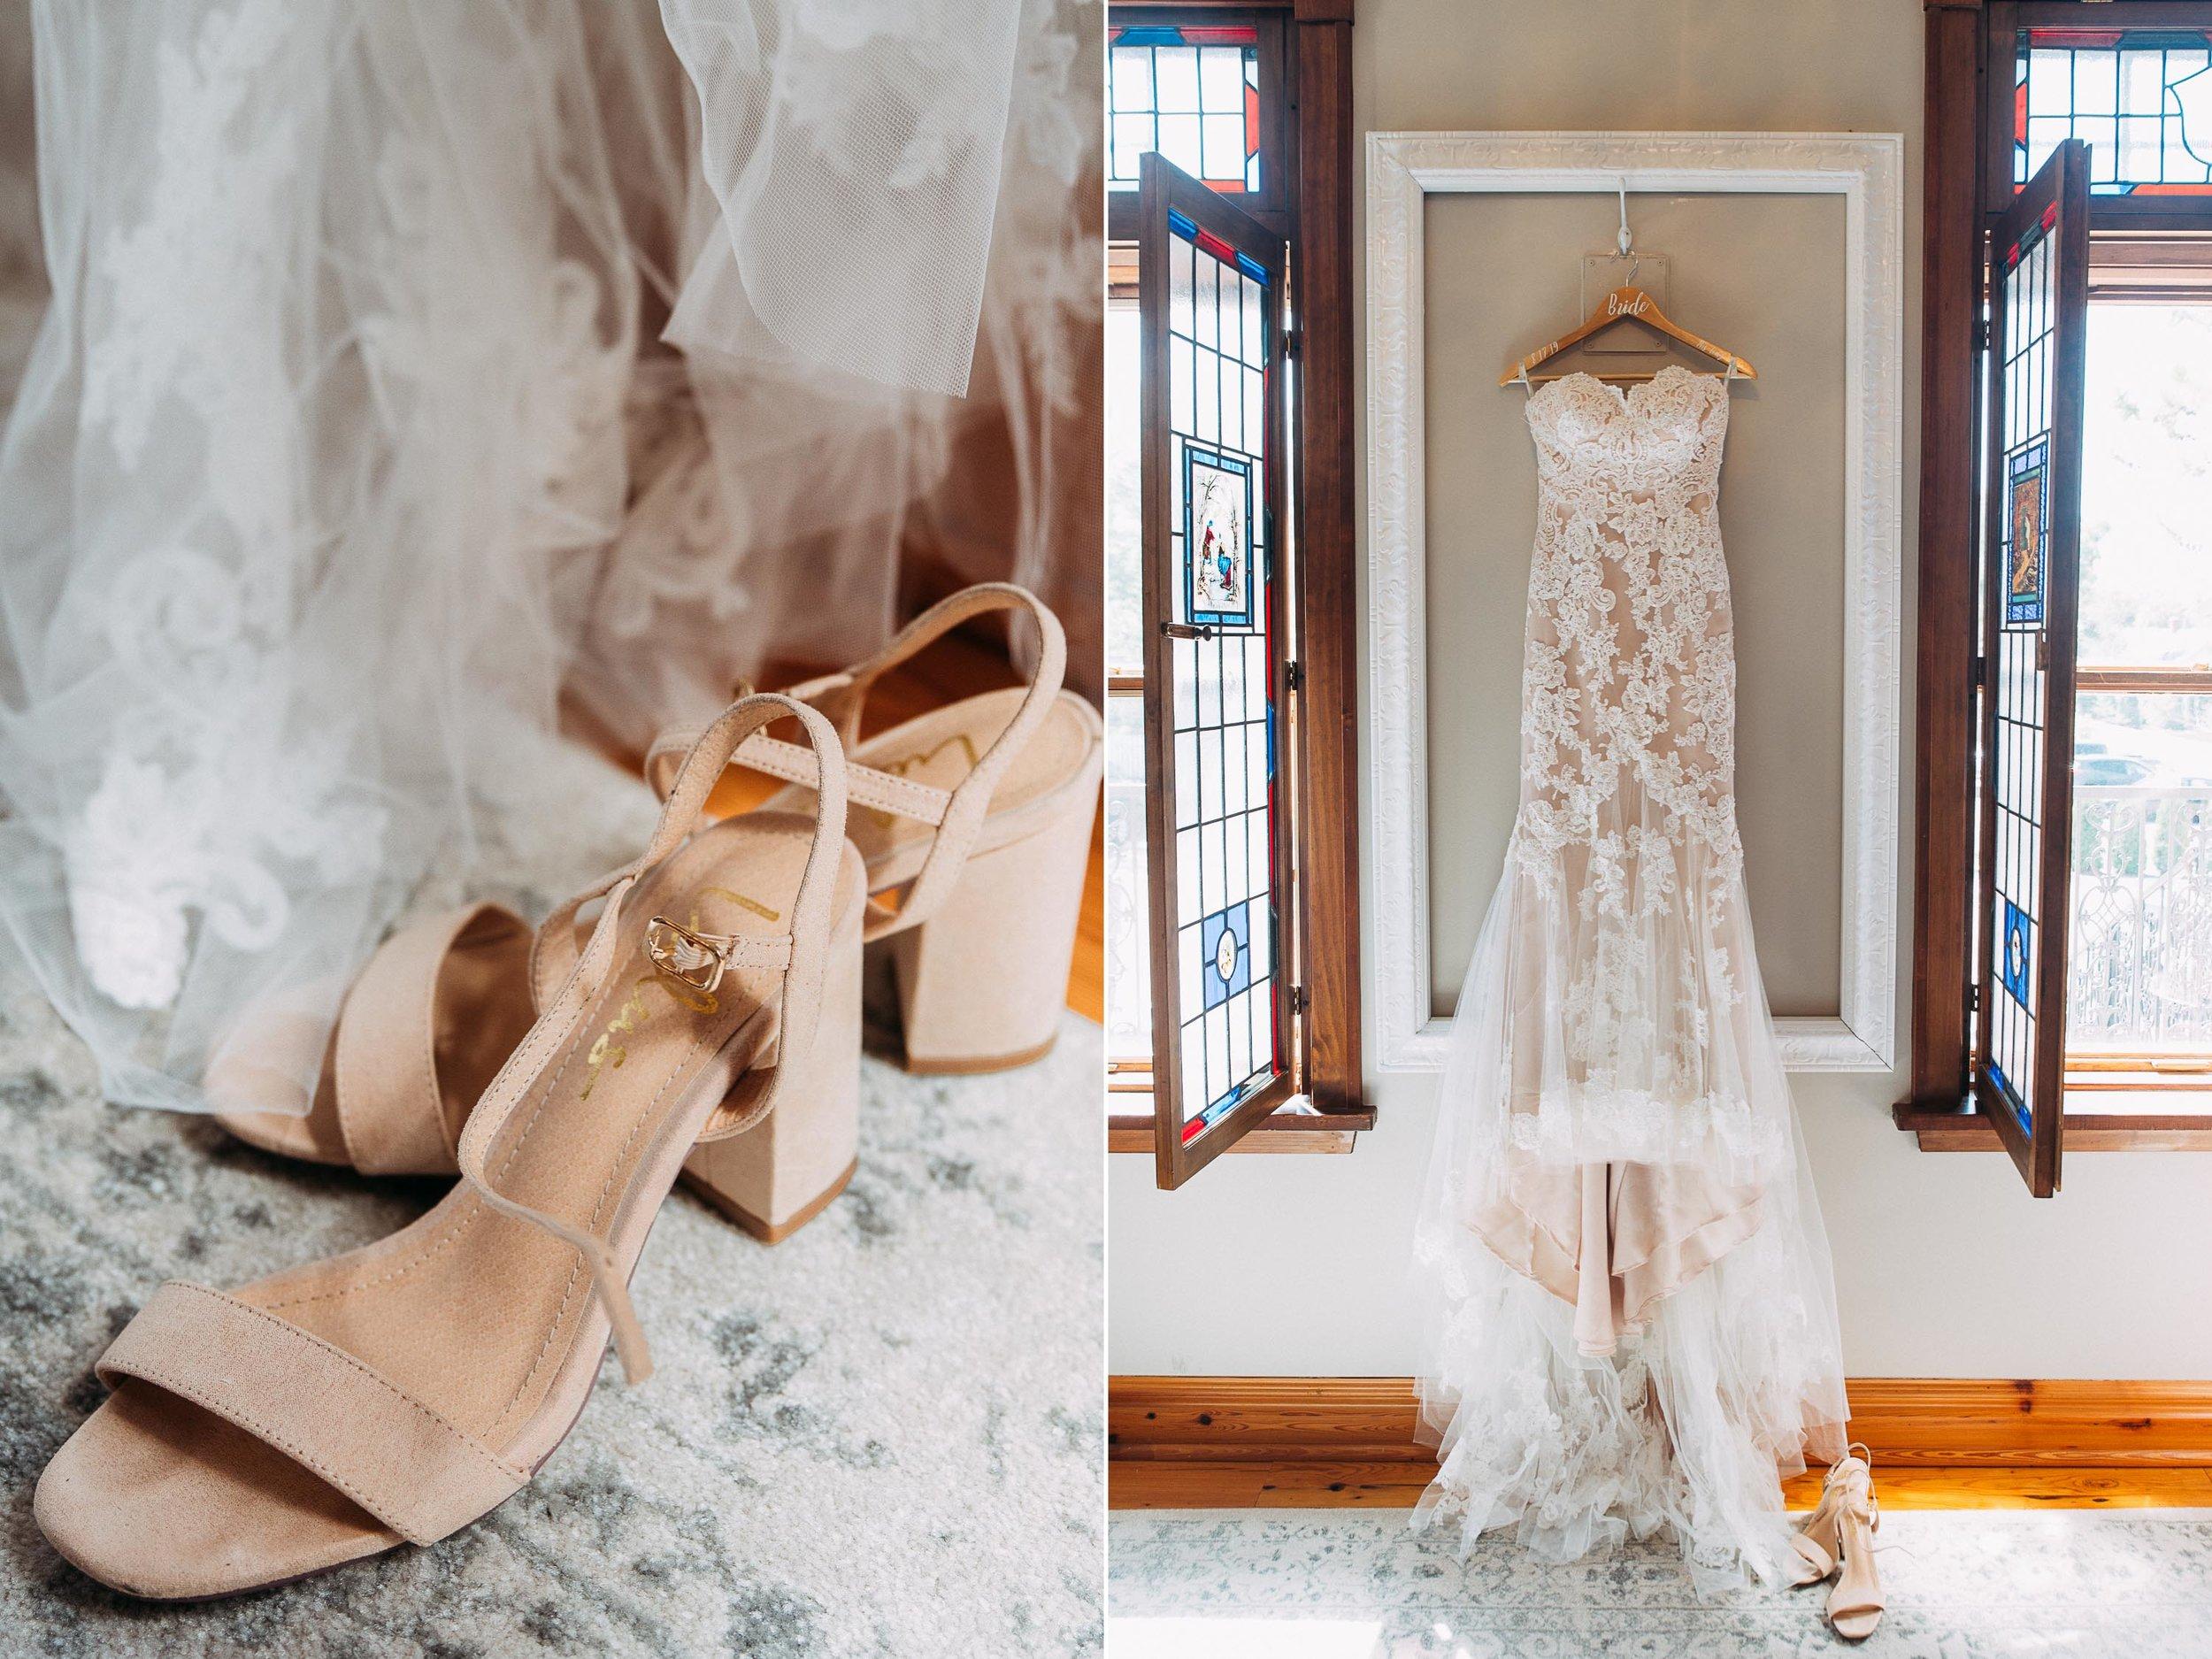 2-WeddingsattheBroz_Minnesota_WeddingBlog_Wedding_Dress.jpg